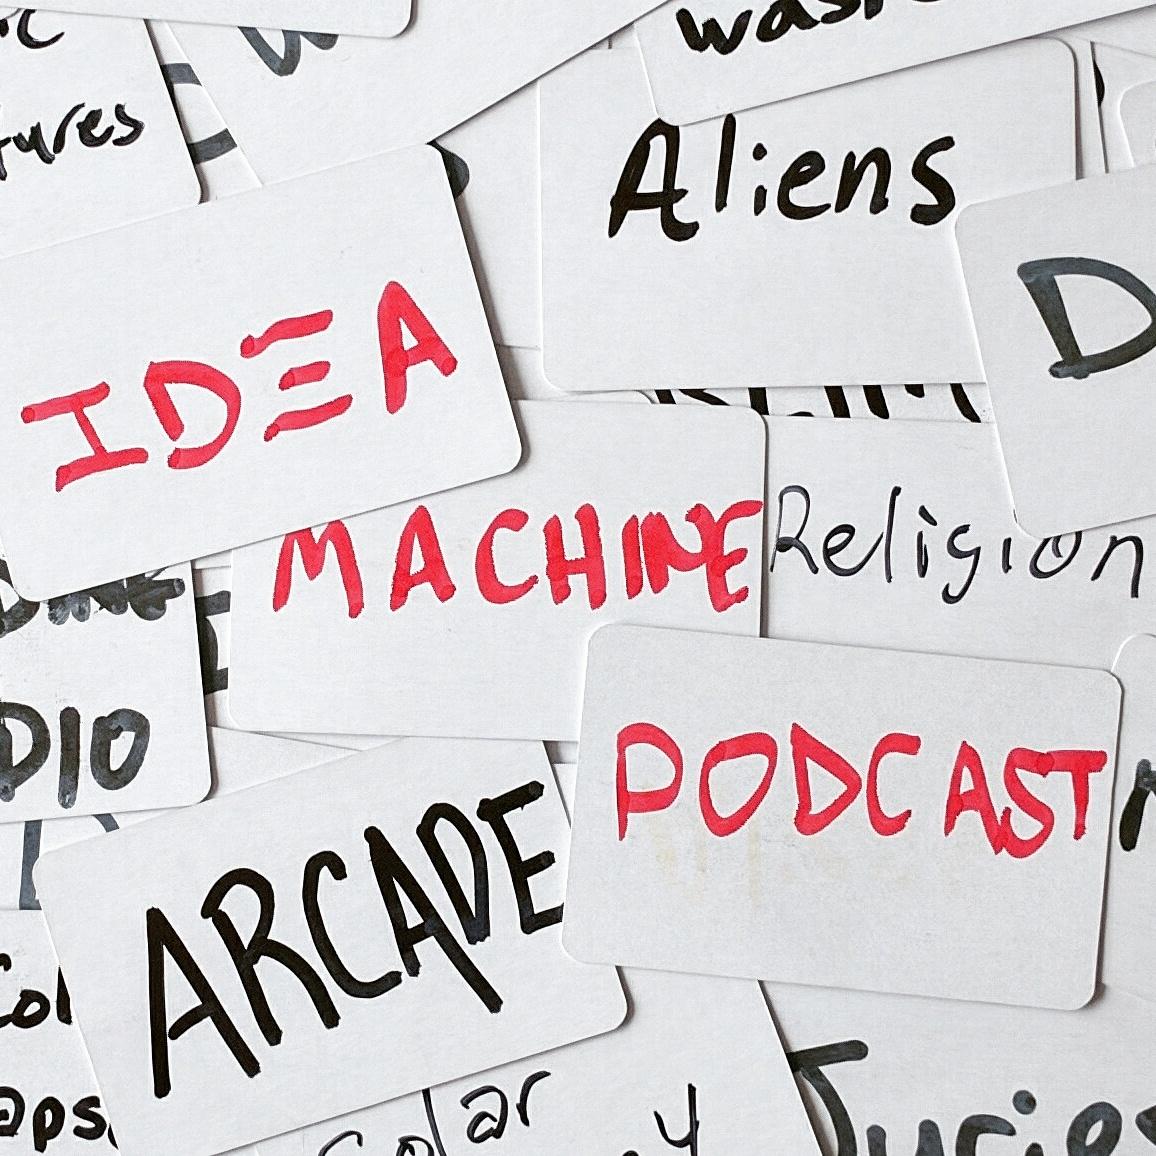 Idea Machine Podcast Episode 5 – Herbal Adrenaline Rush